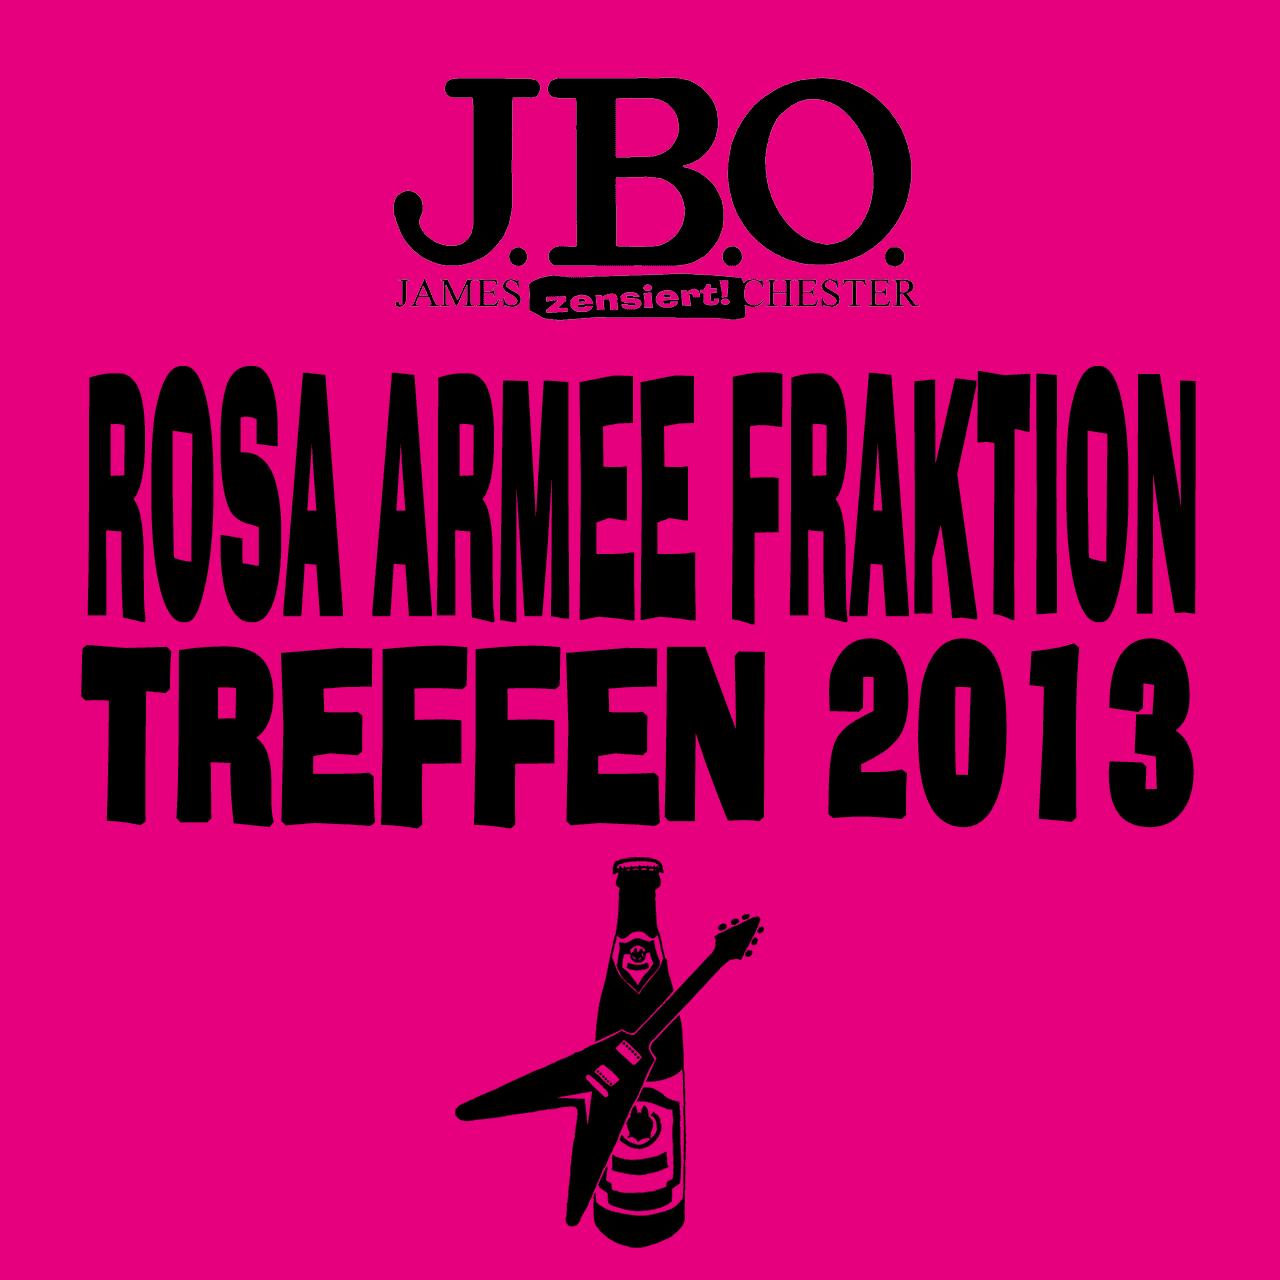 Rosa Armee Fraktion Treffen 2013